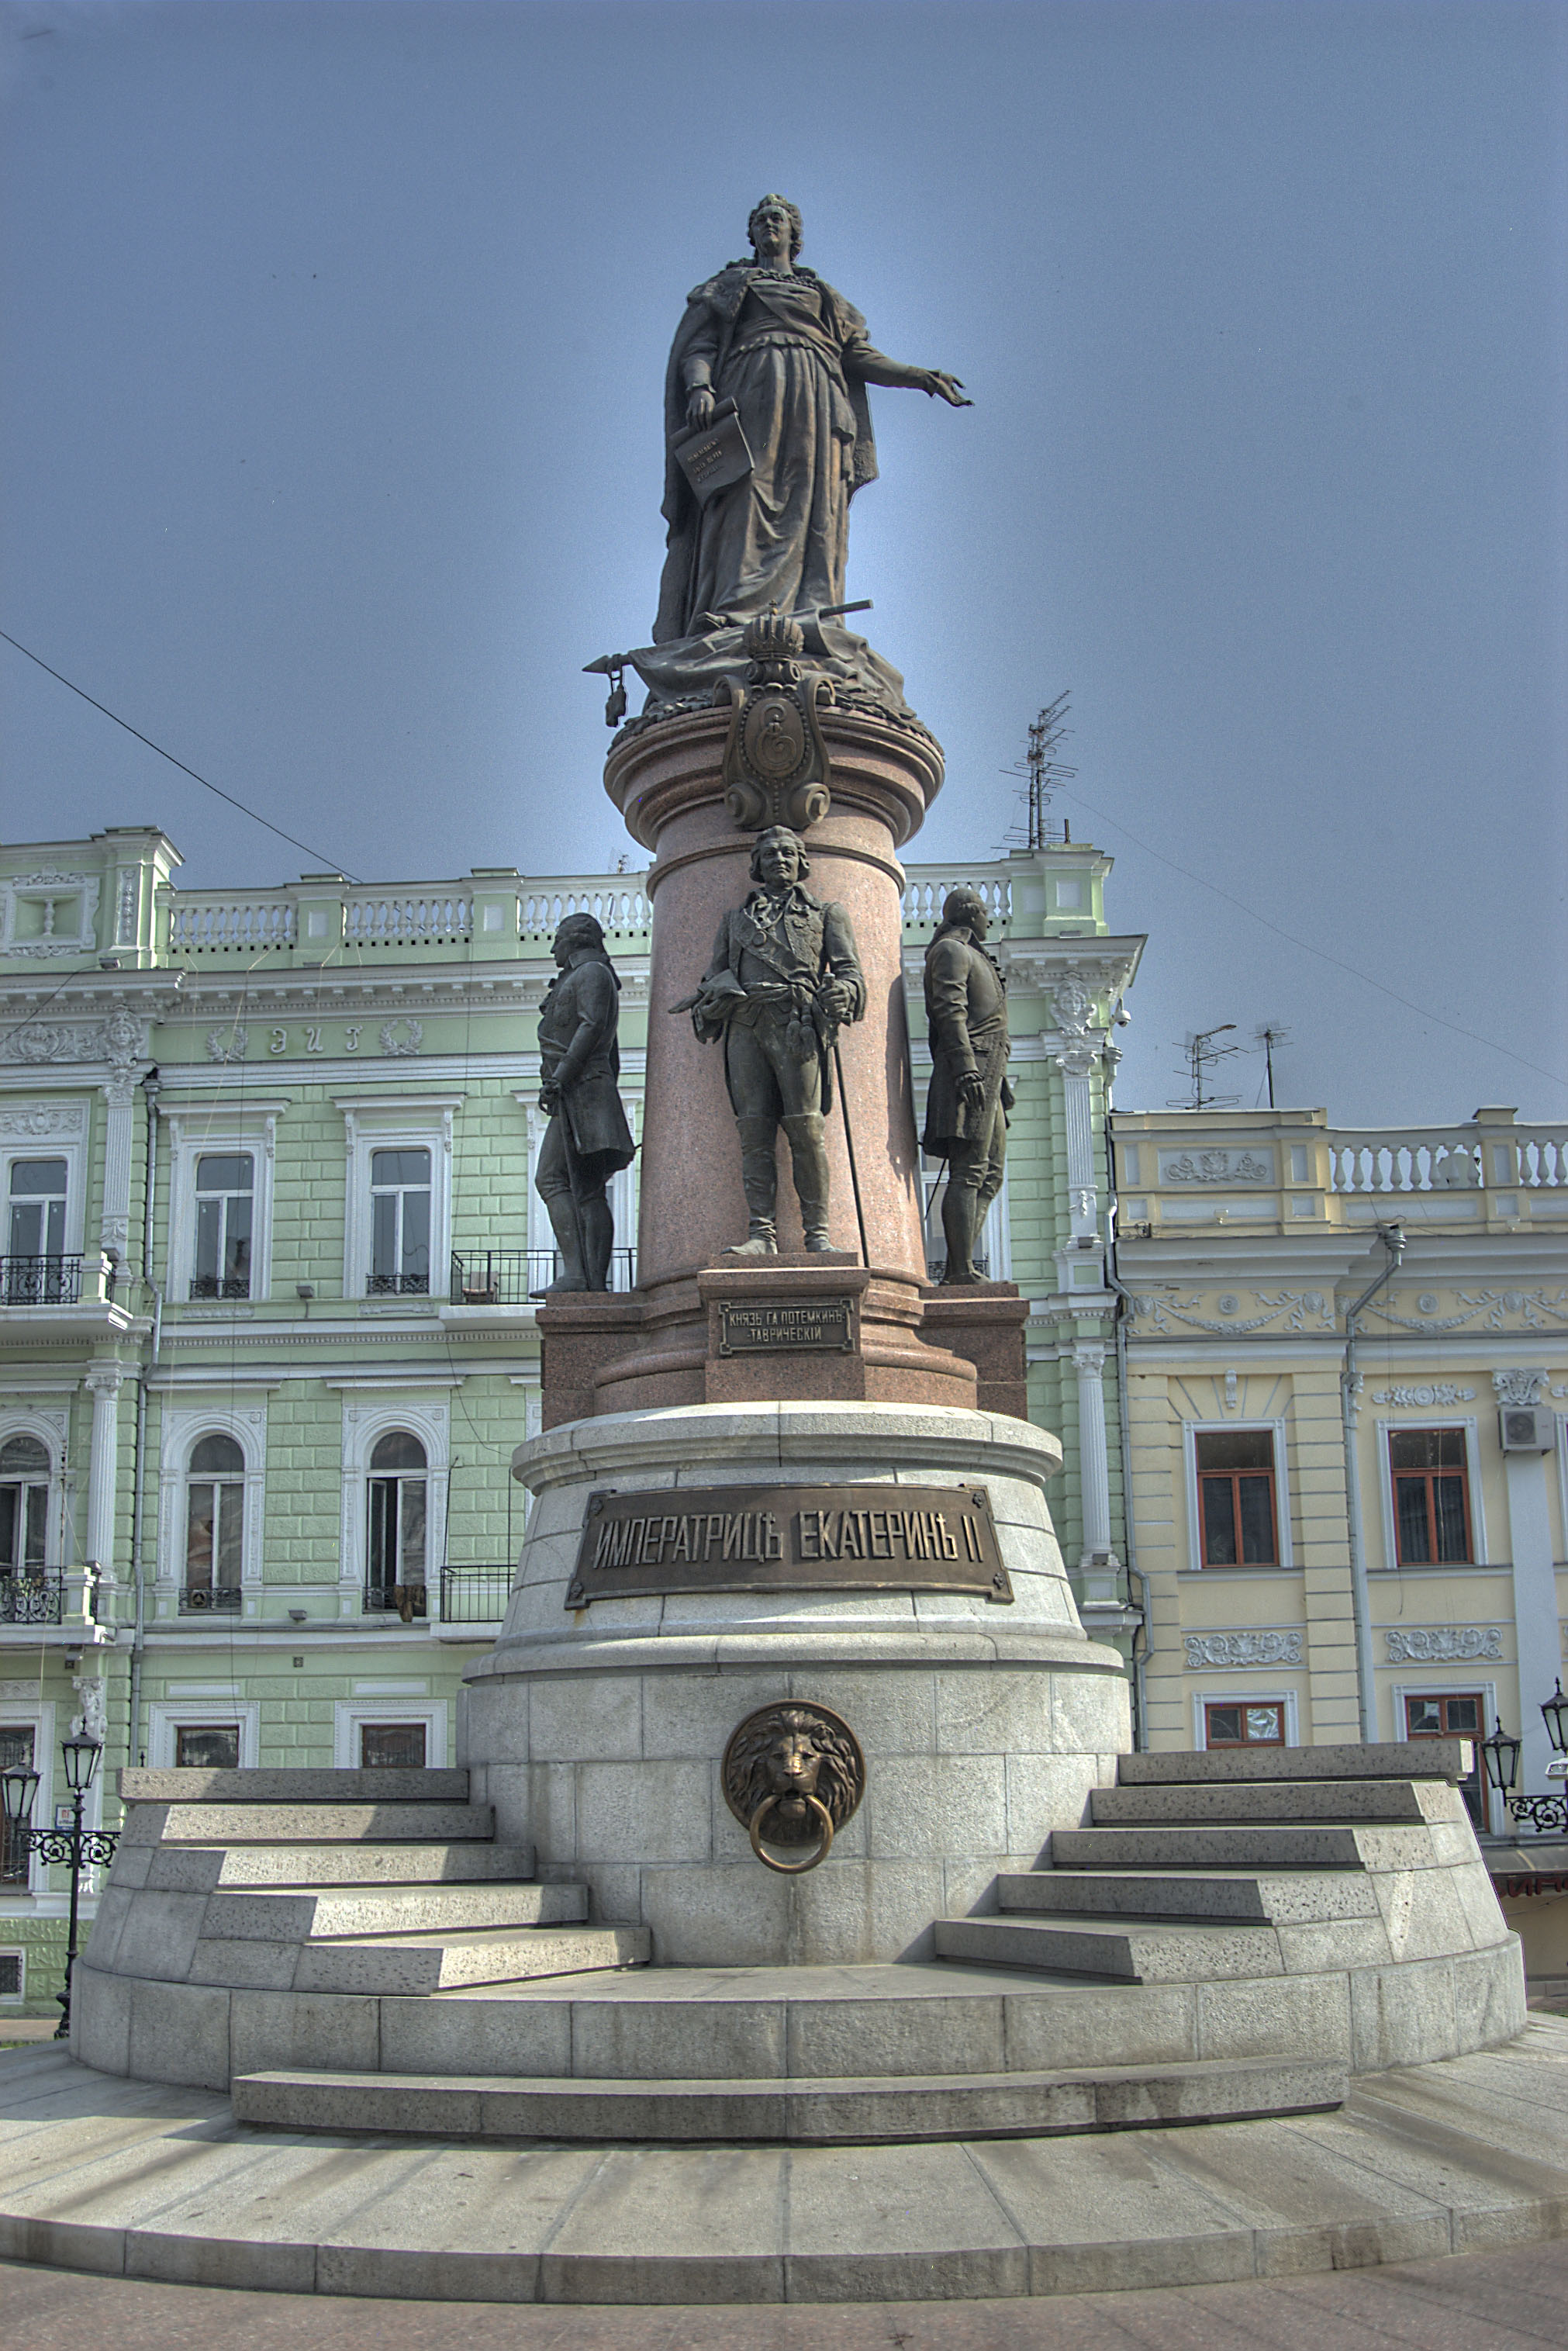 http://www.asergeev.com/p/xl-2009-771-19/odessa_ukraine_june-catherine_monument_ekaterininskaya_square_odessa.jpg